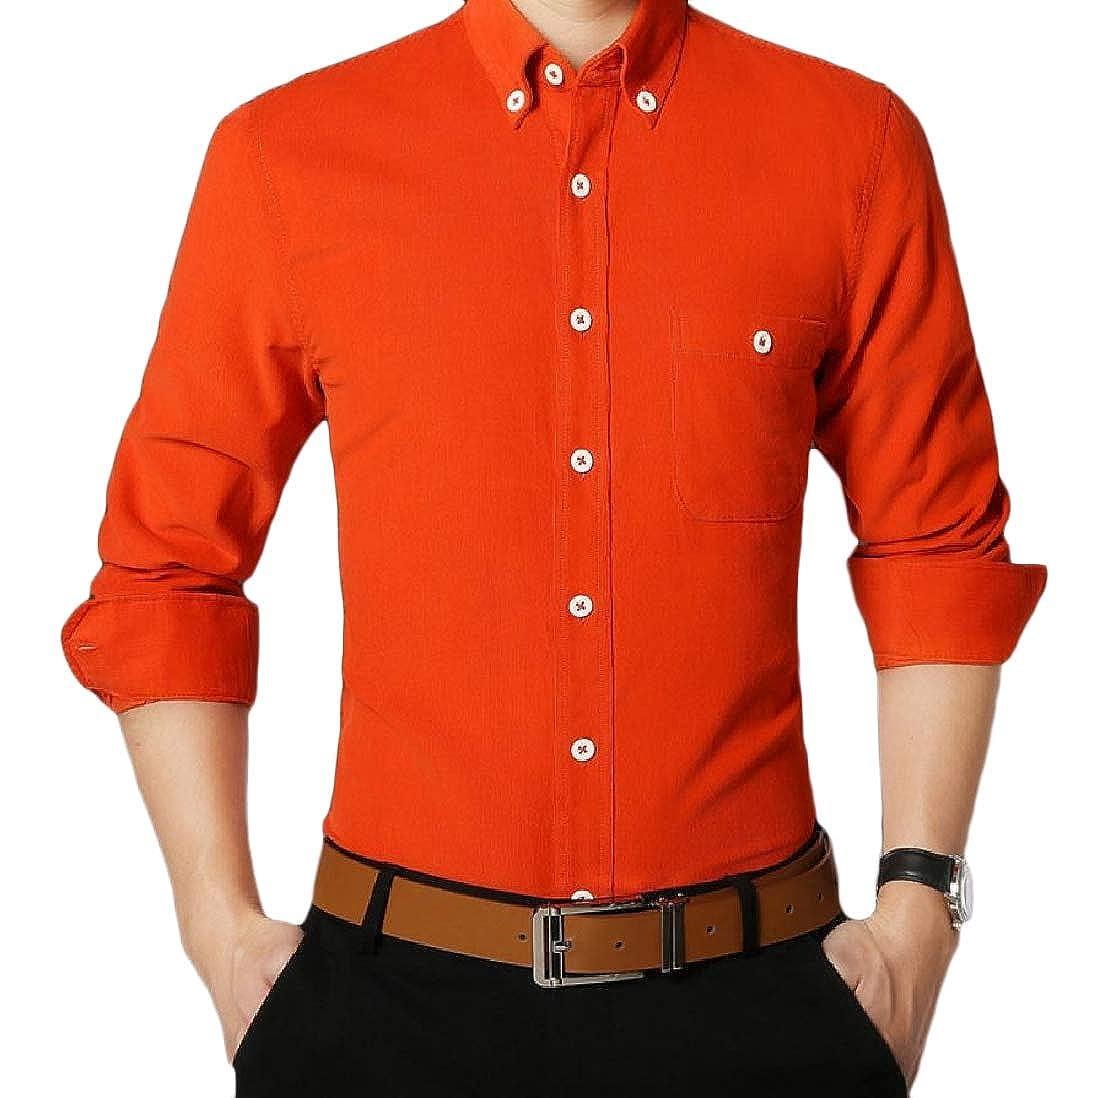 YUNY Mens Button-Down-Shirts Business Corduroy Slim Fitting Shirt Orange 2XL